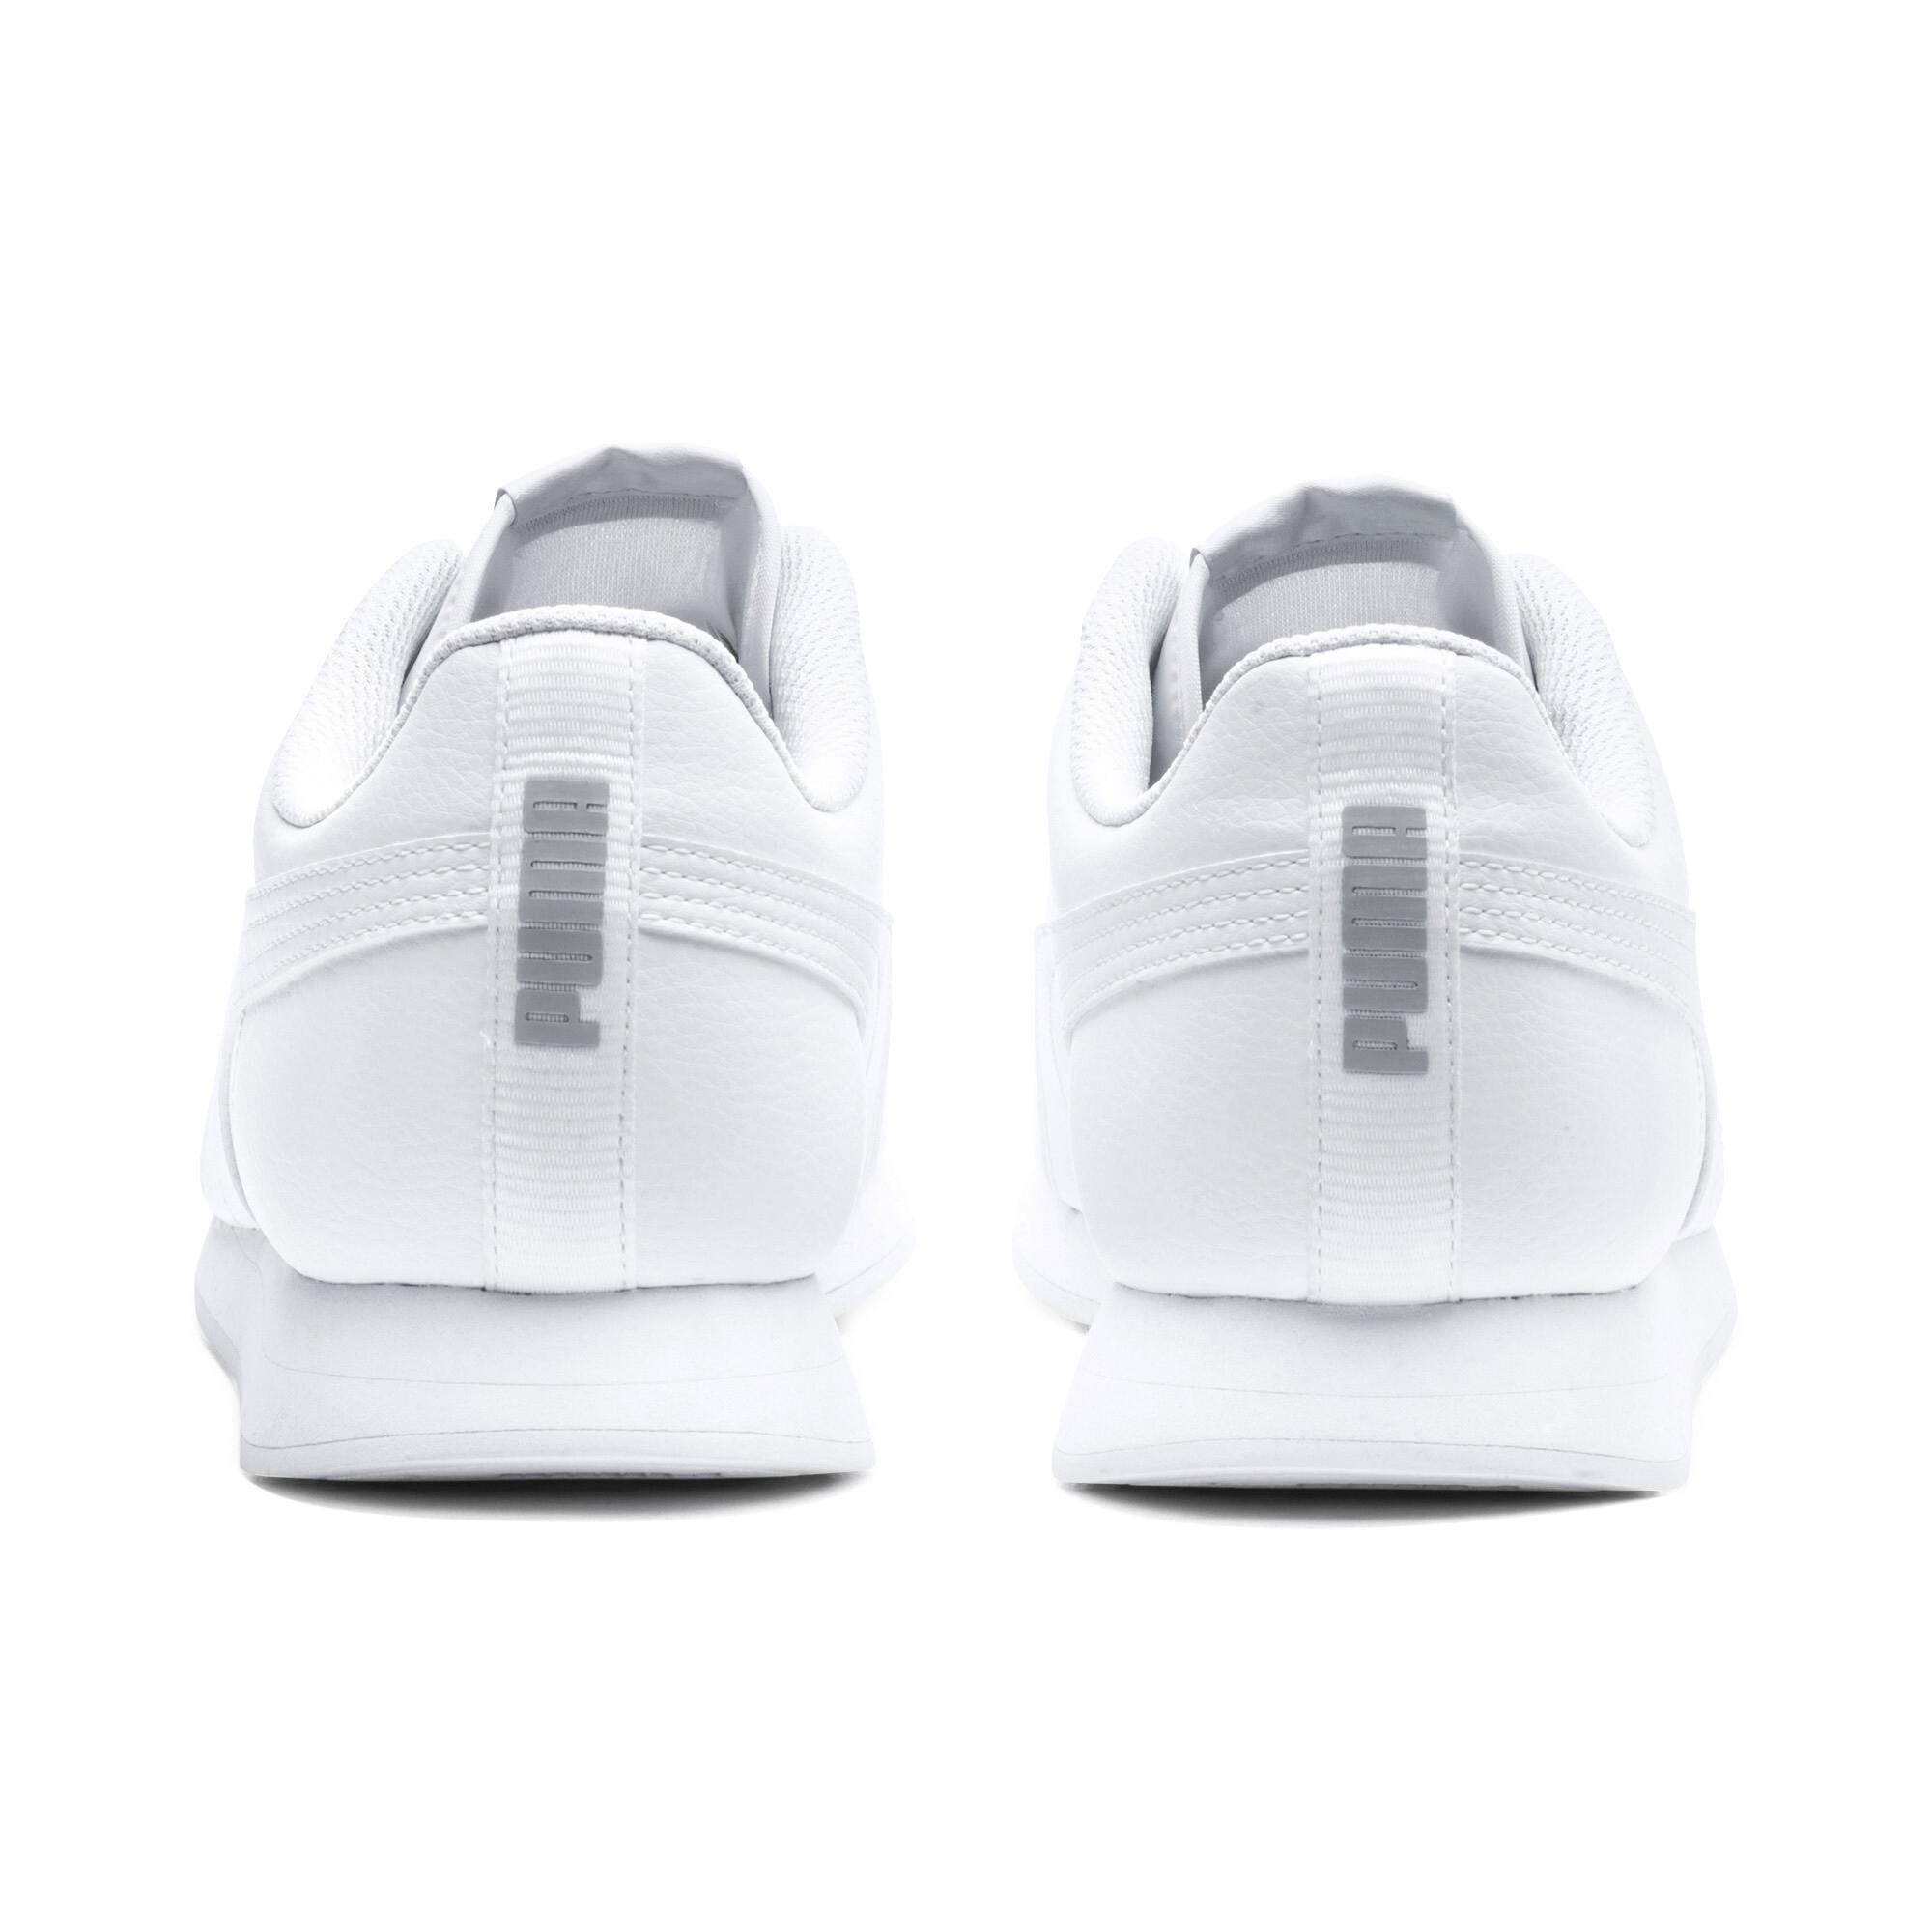 PUMA-Men-039-s-Turin-II-Sneakers thumbnail 9